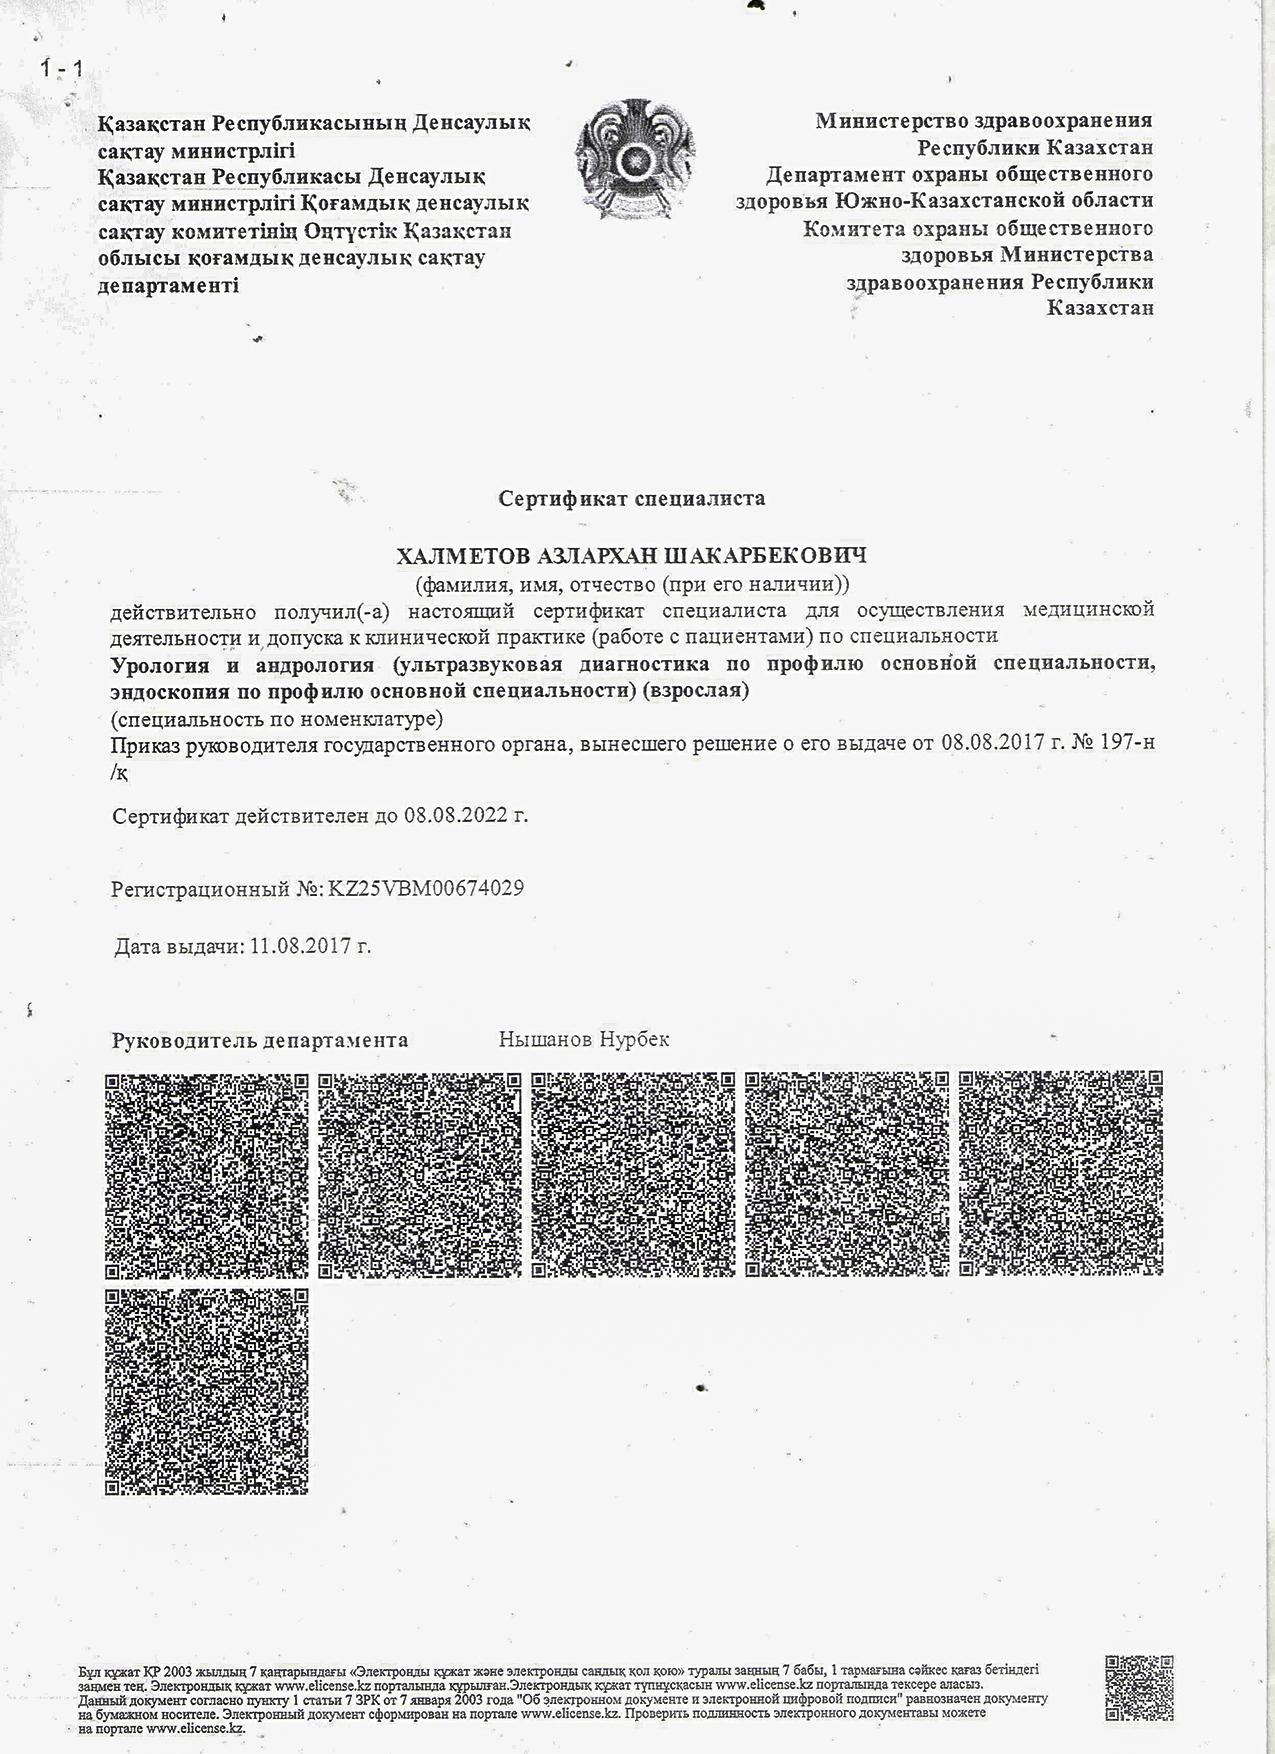 Сертификат уролога клиники Akniet Shipa сайрамский р-н. с. Карабулак